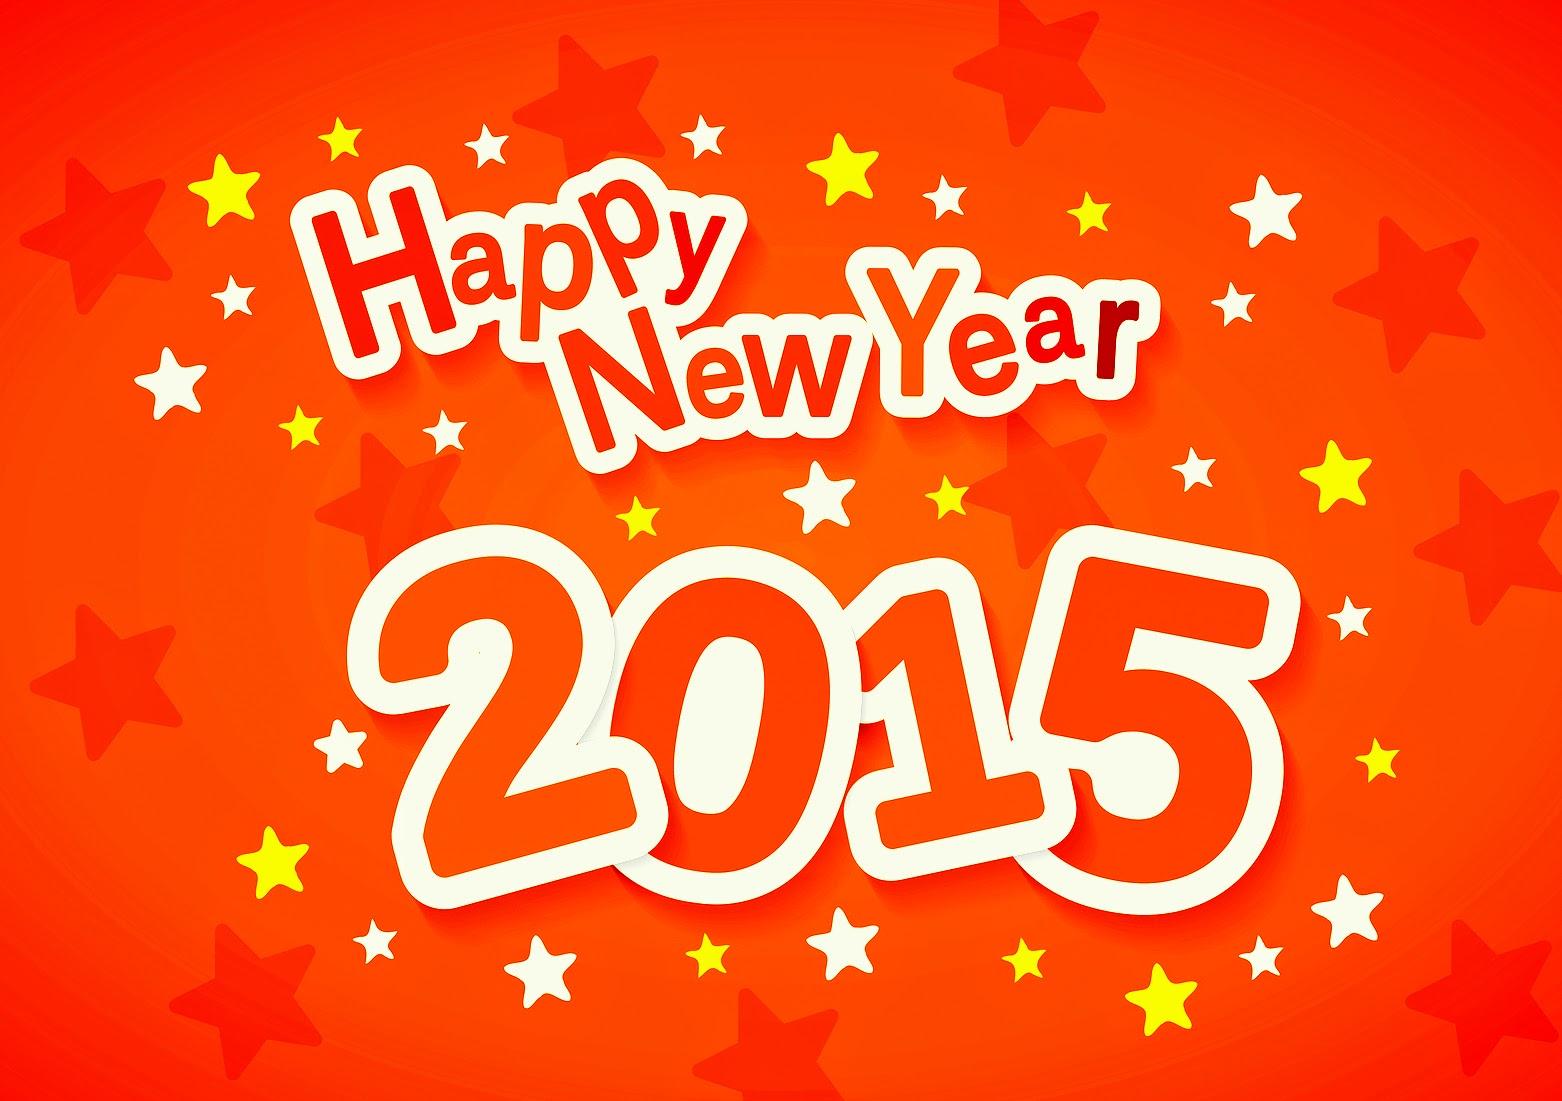 Happy new year 2015 kilkenny model school happy new year 2015 happy new year 2015 kristyandbryce Choice Image